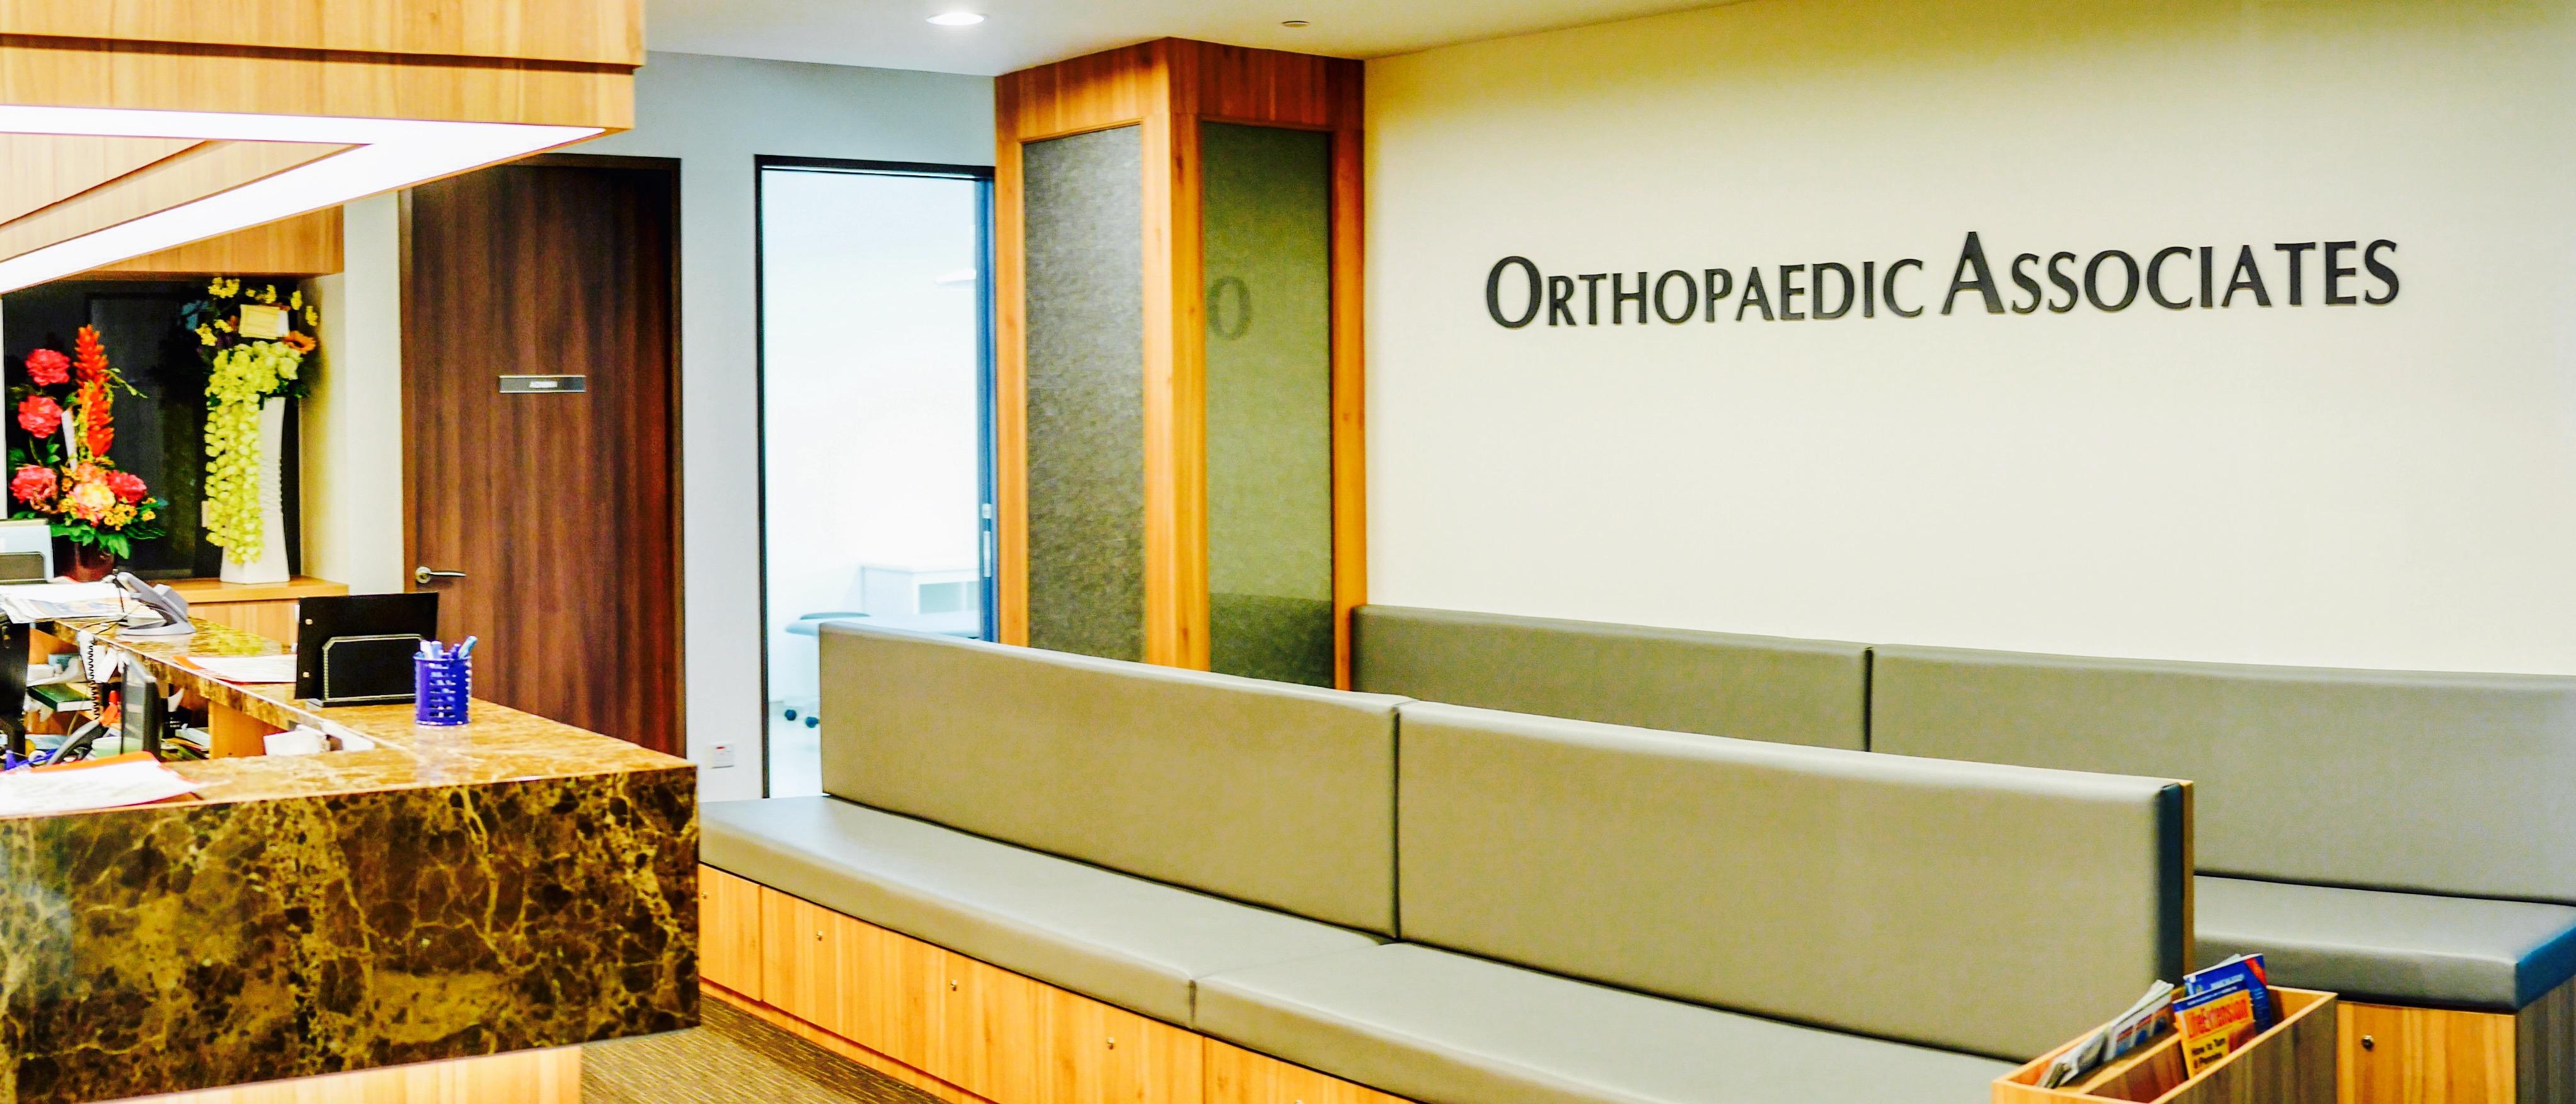 About Orthopaedic Associates Singapore